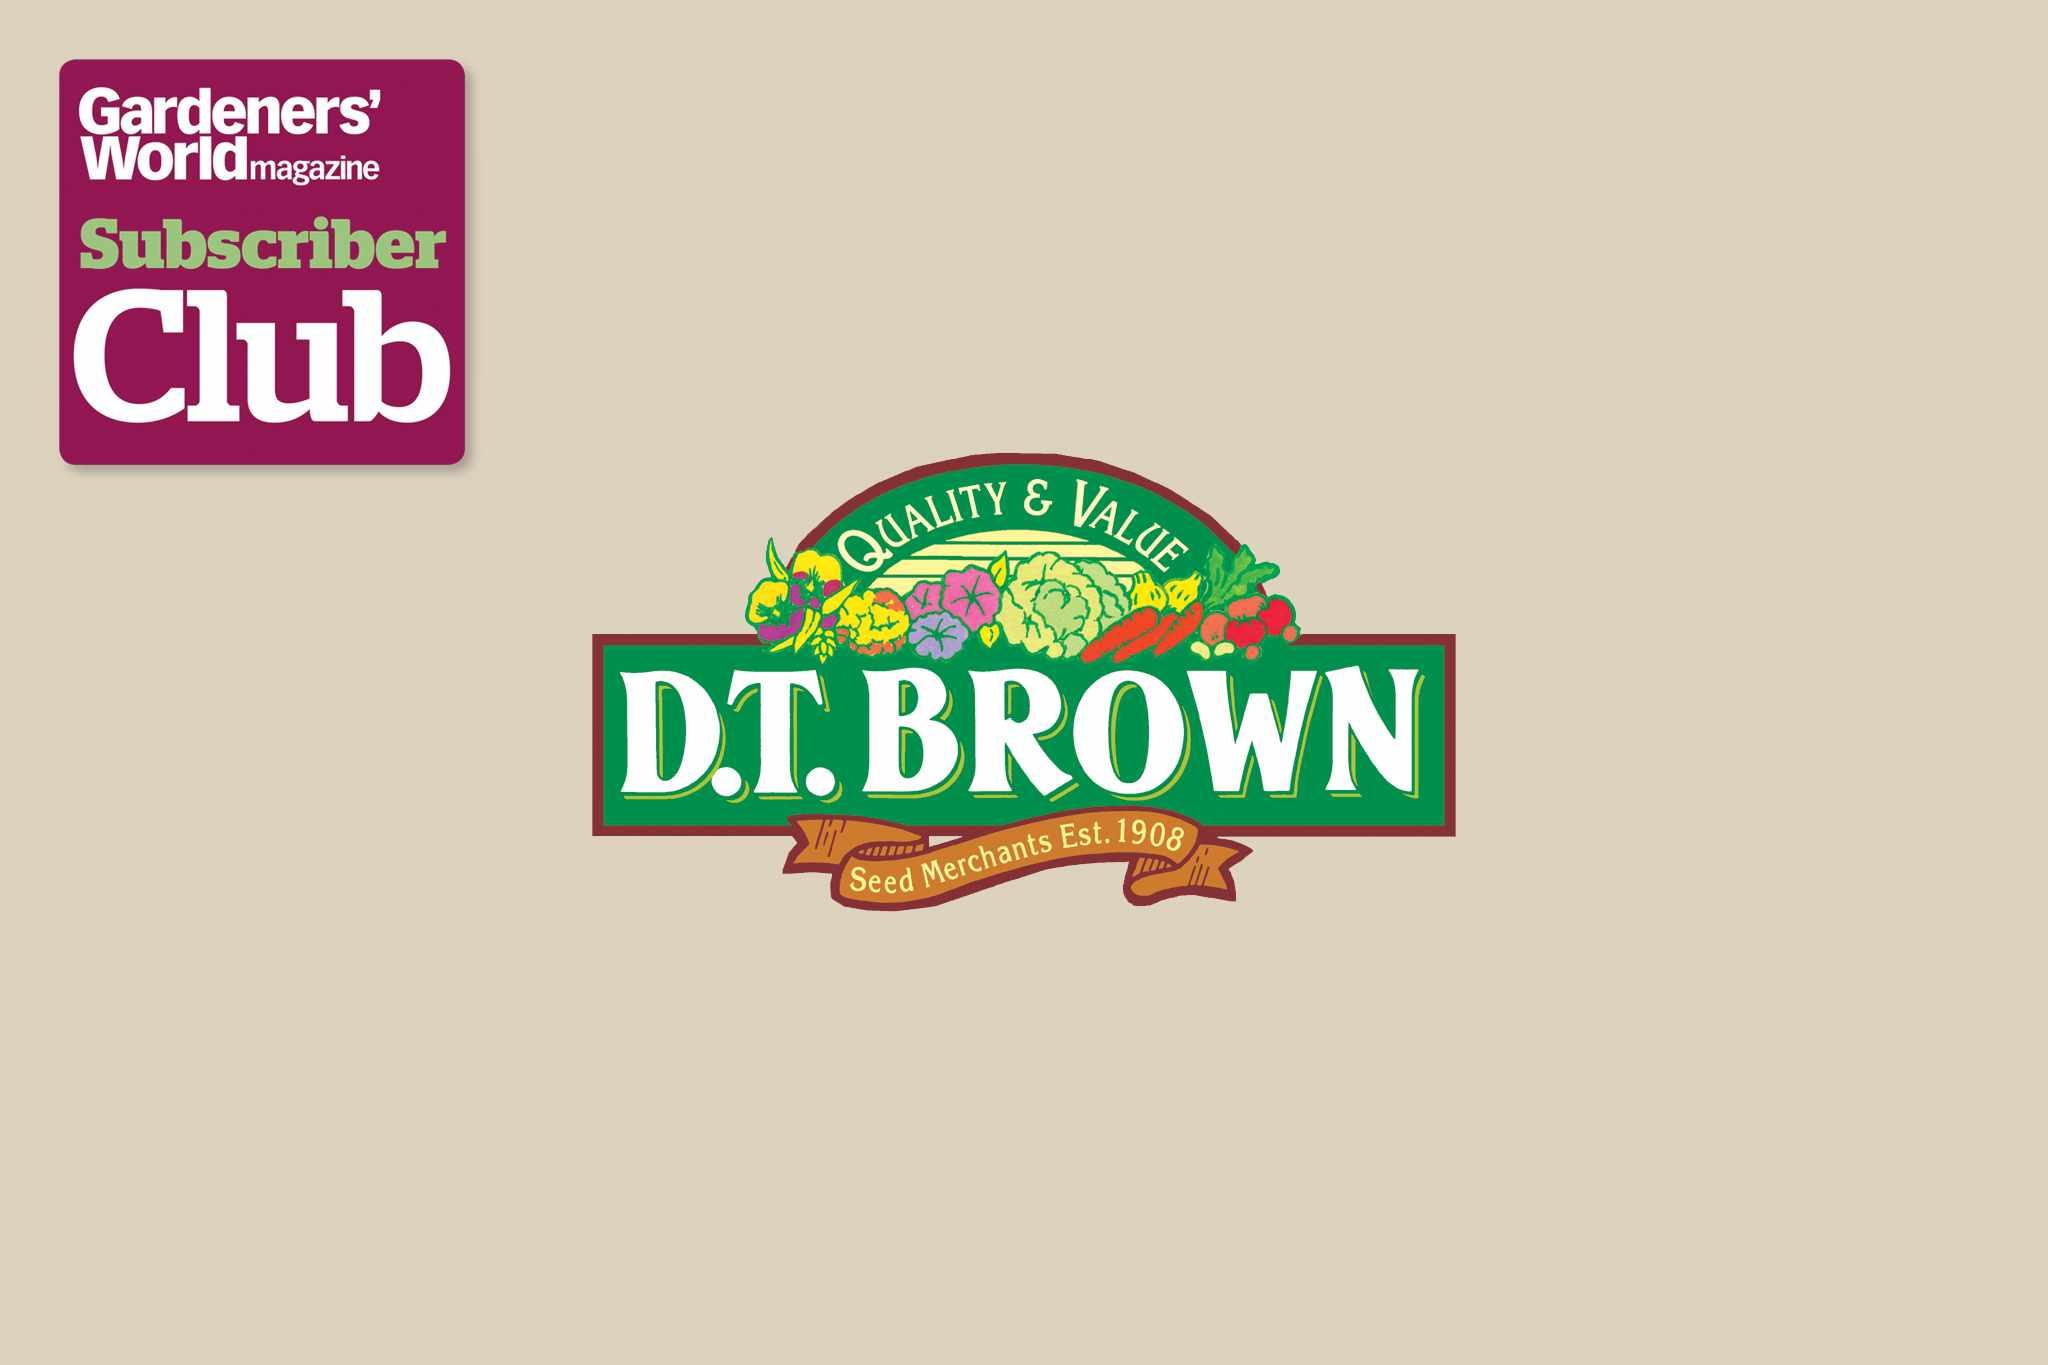 D T BrownGarden Bird Supplies BBC Gardeners' World Magazine Subscriber Club discount